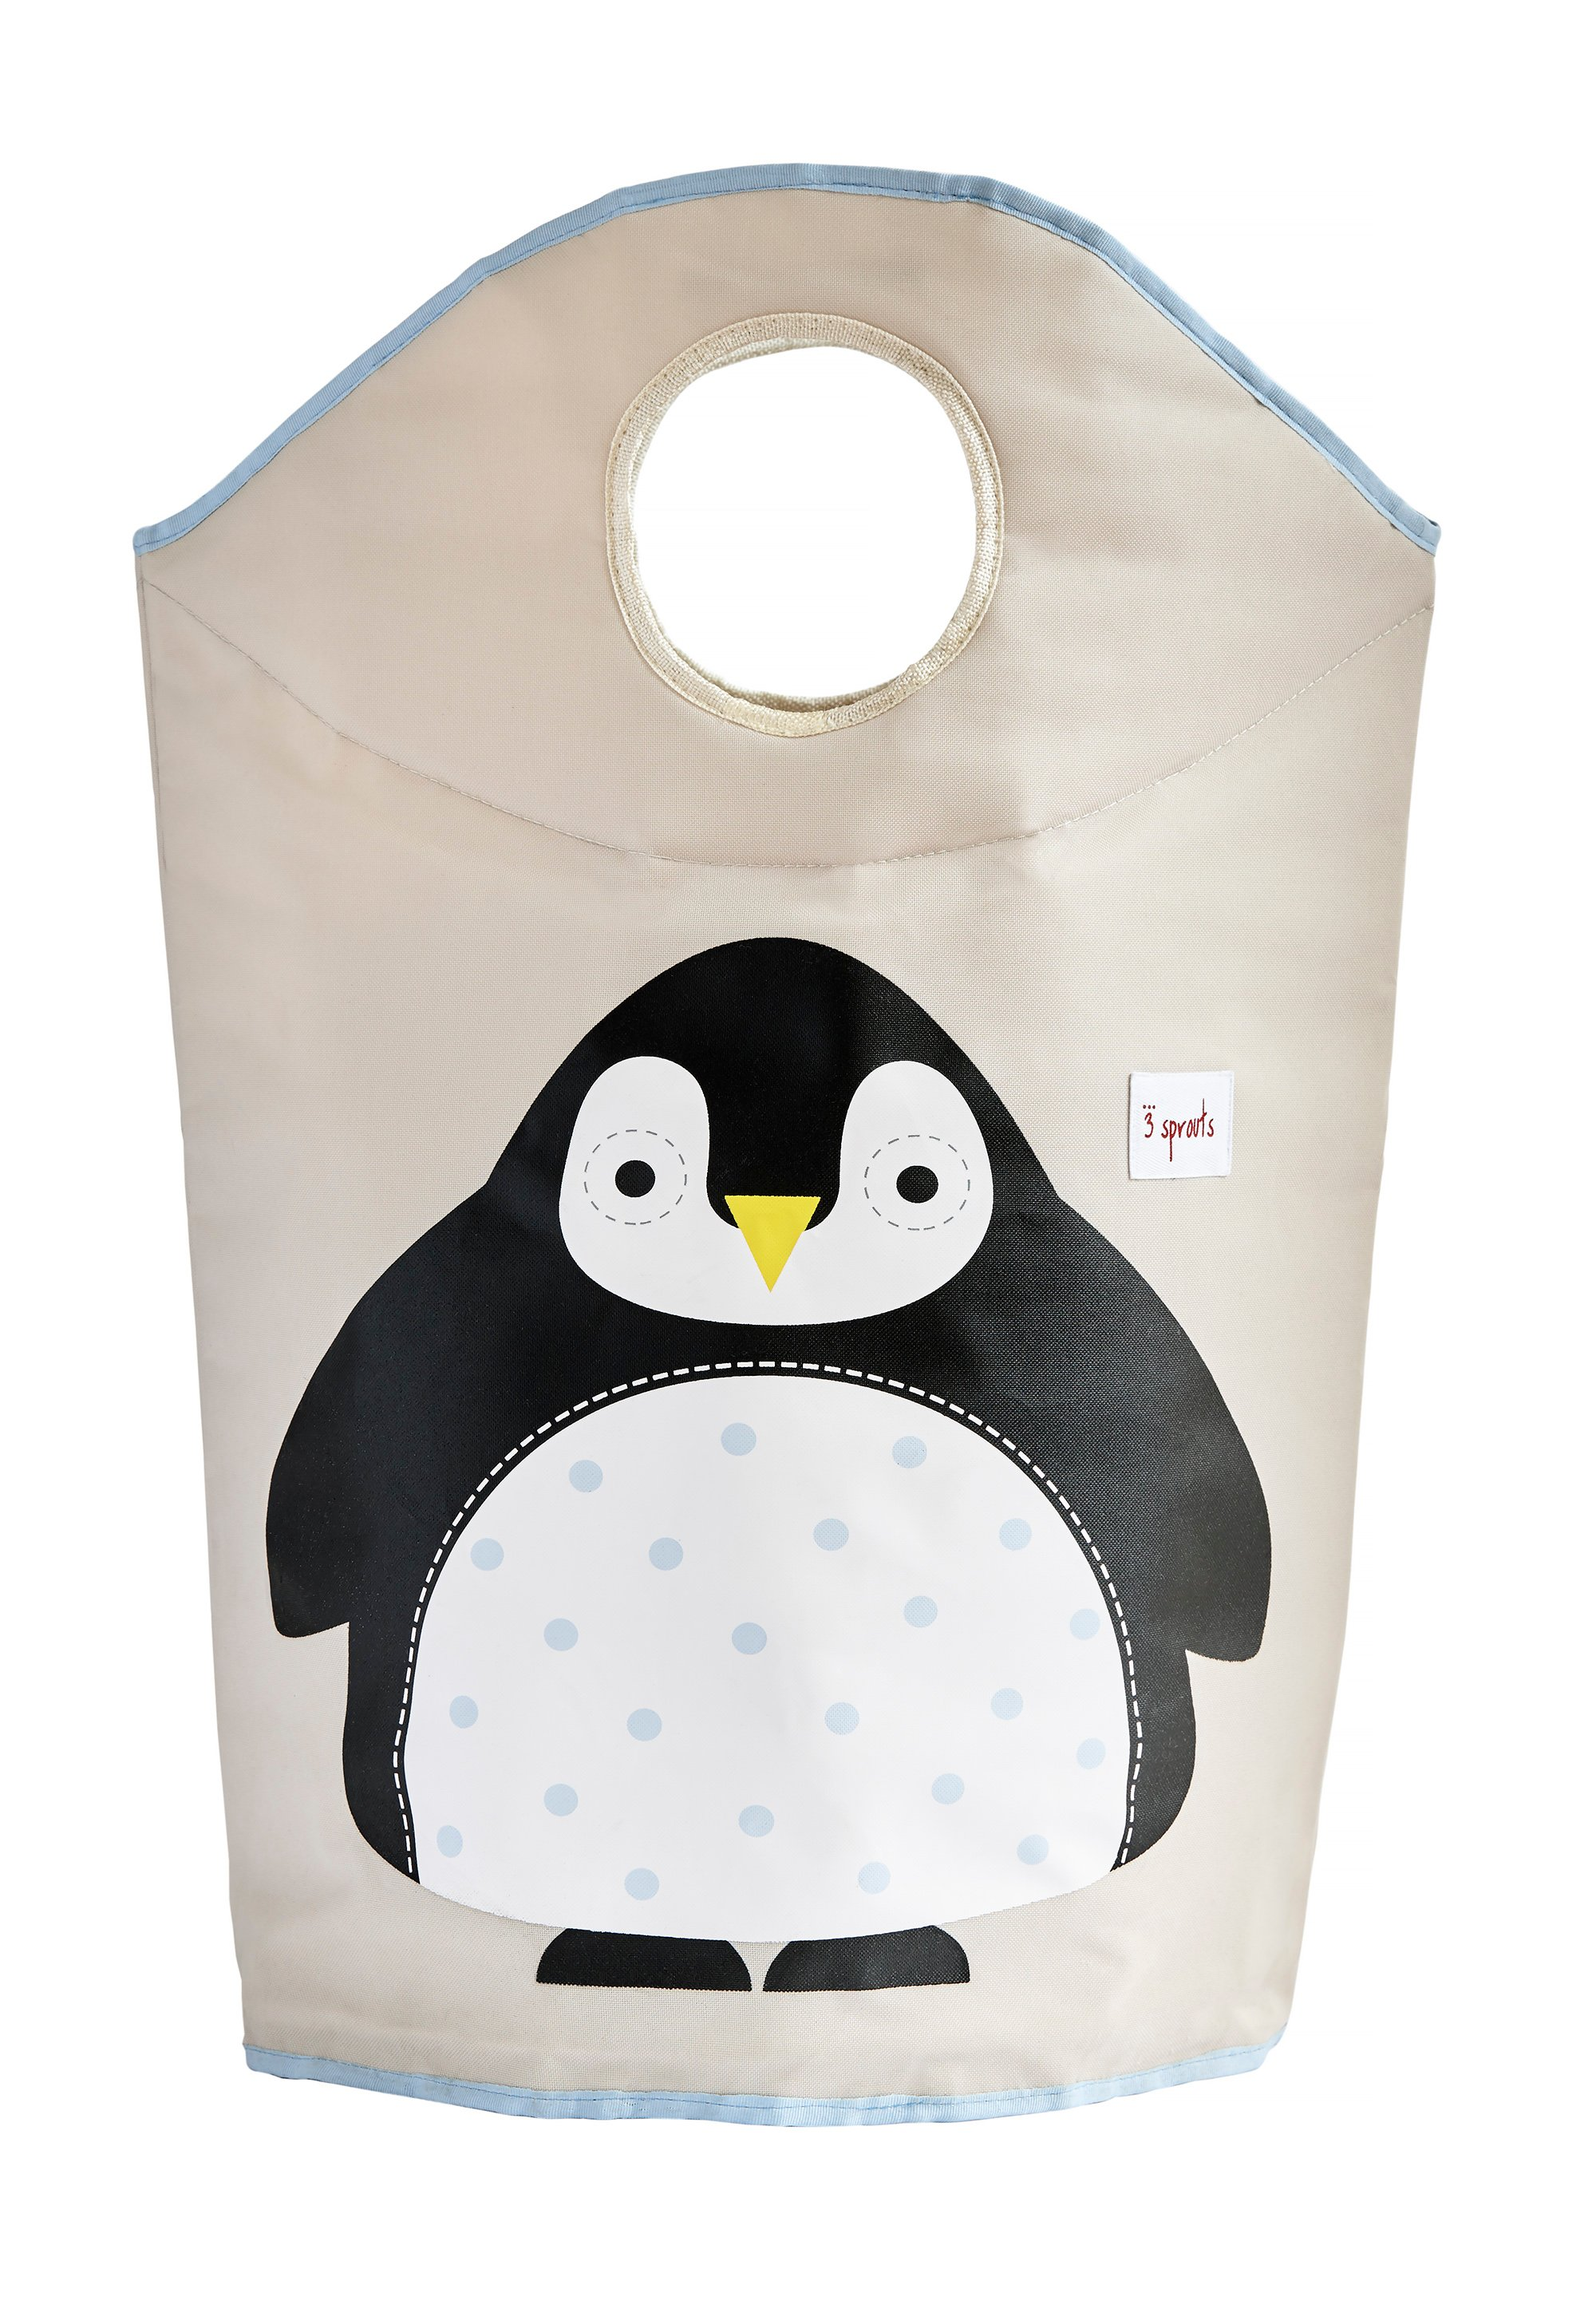 3 Sprouts - Laundry Hamper - Black Penguin